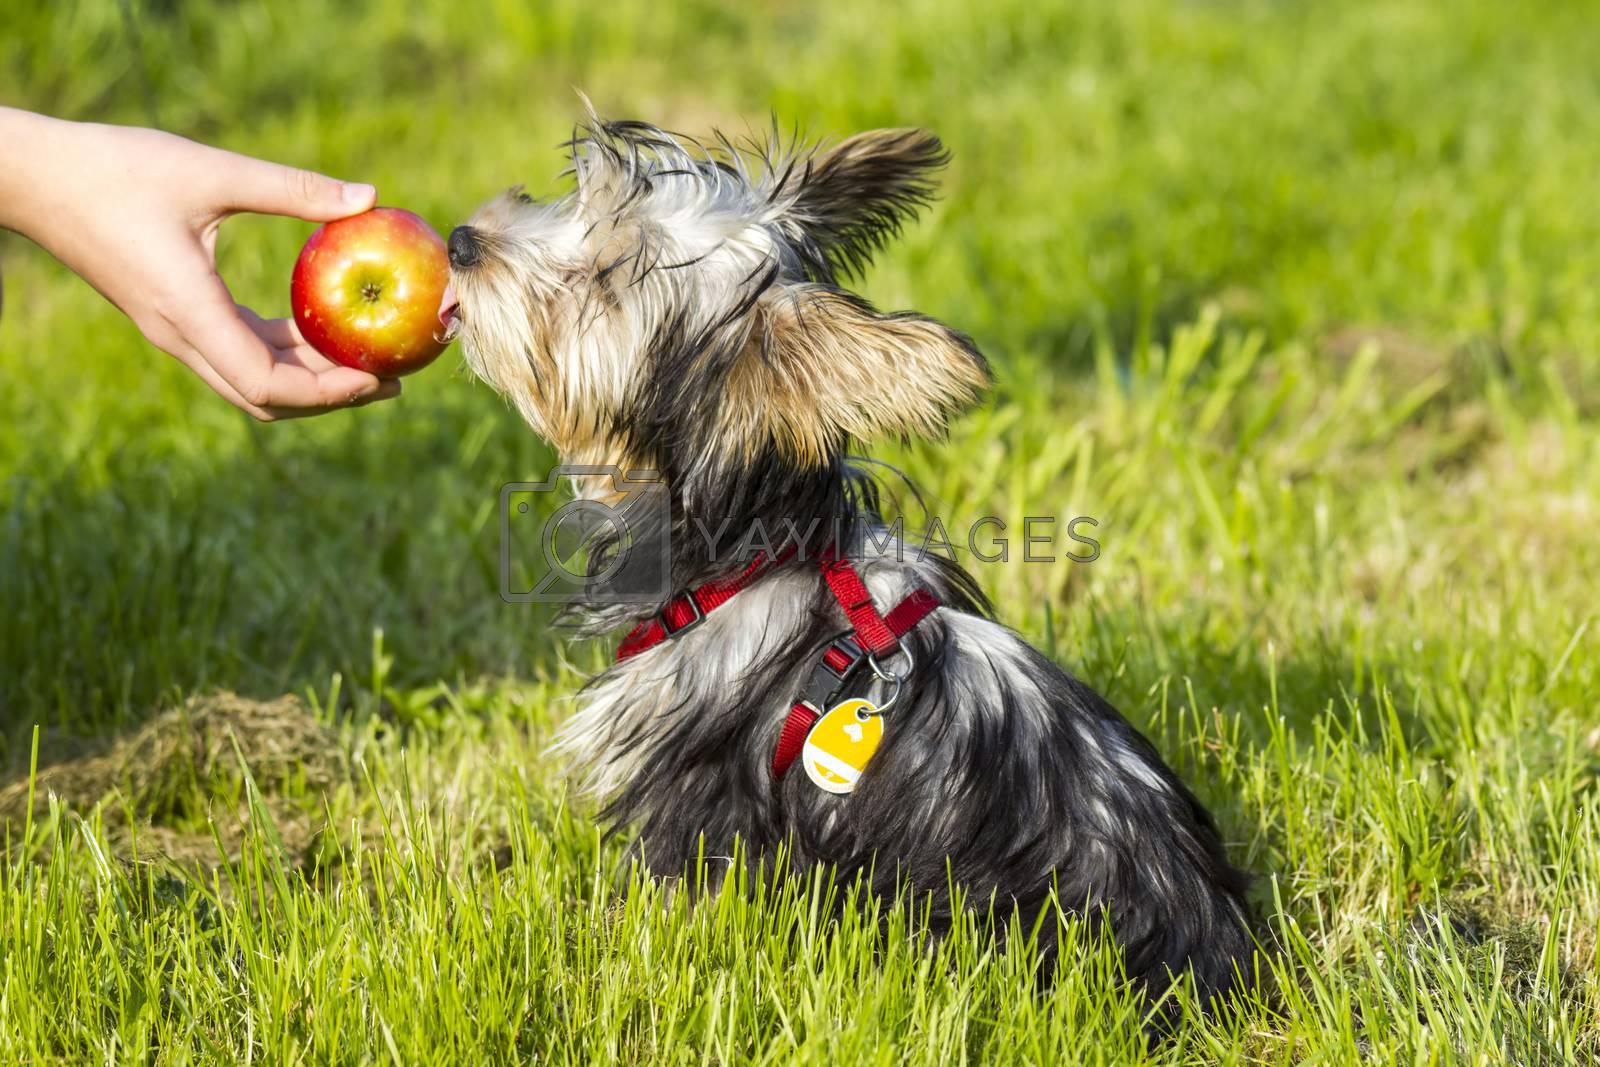 yorkshire terrier is eating apple